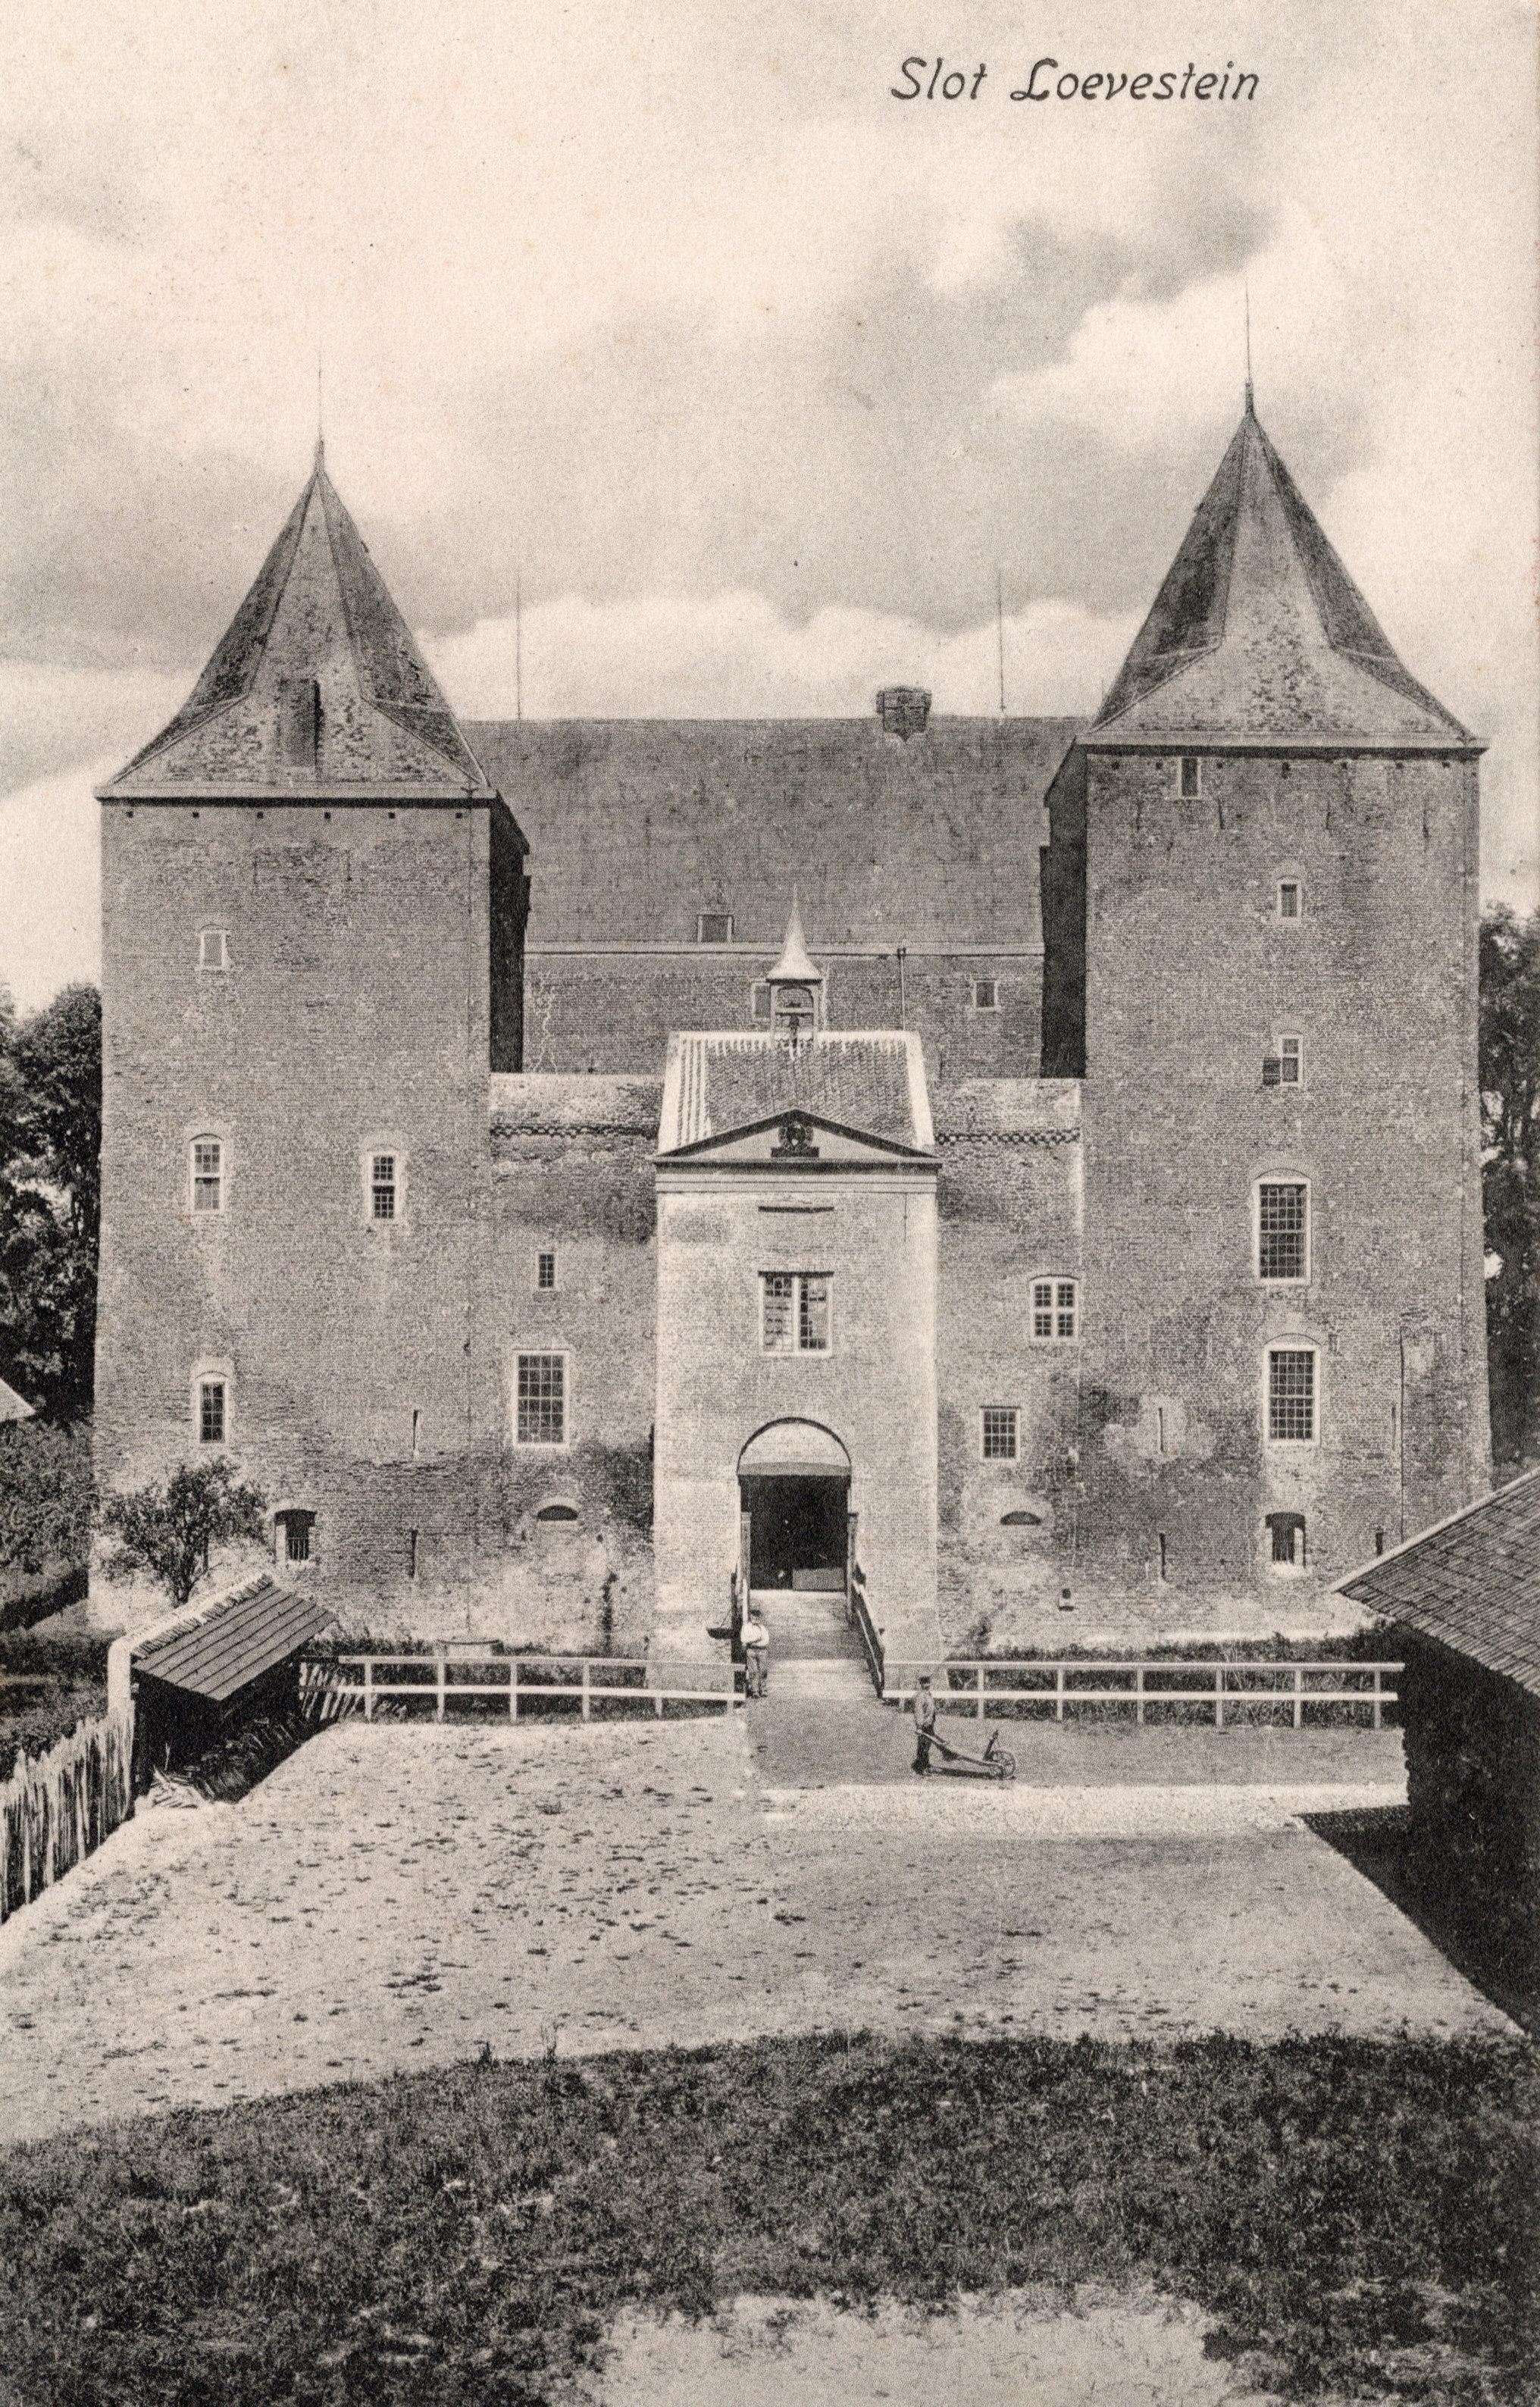 A1-Slot-Loevestein-1925